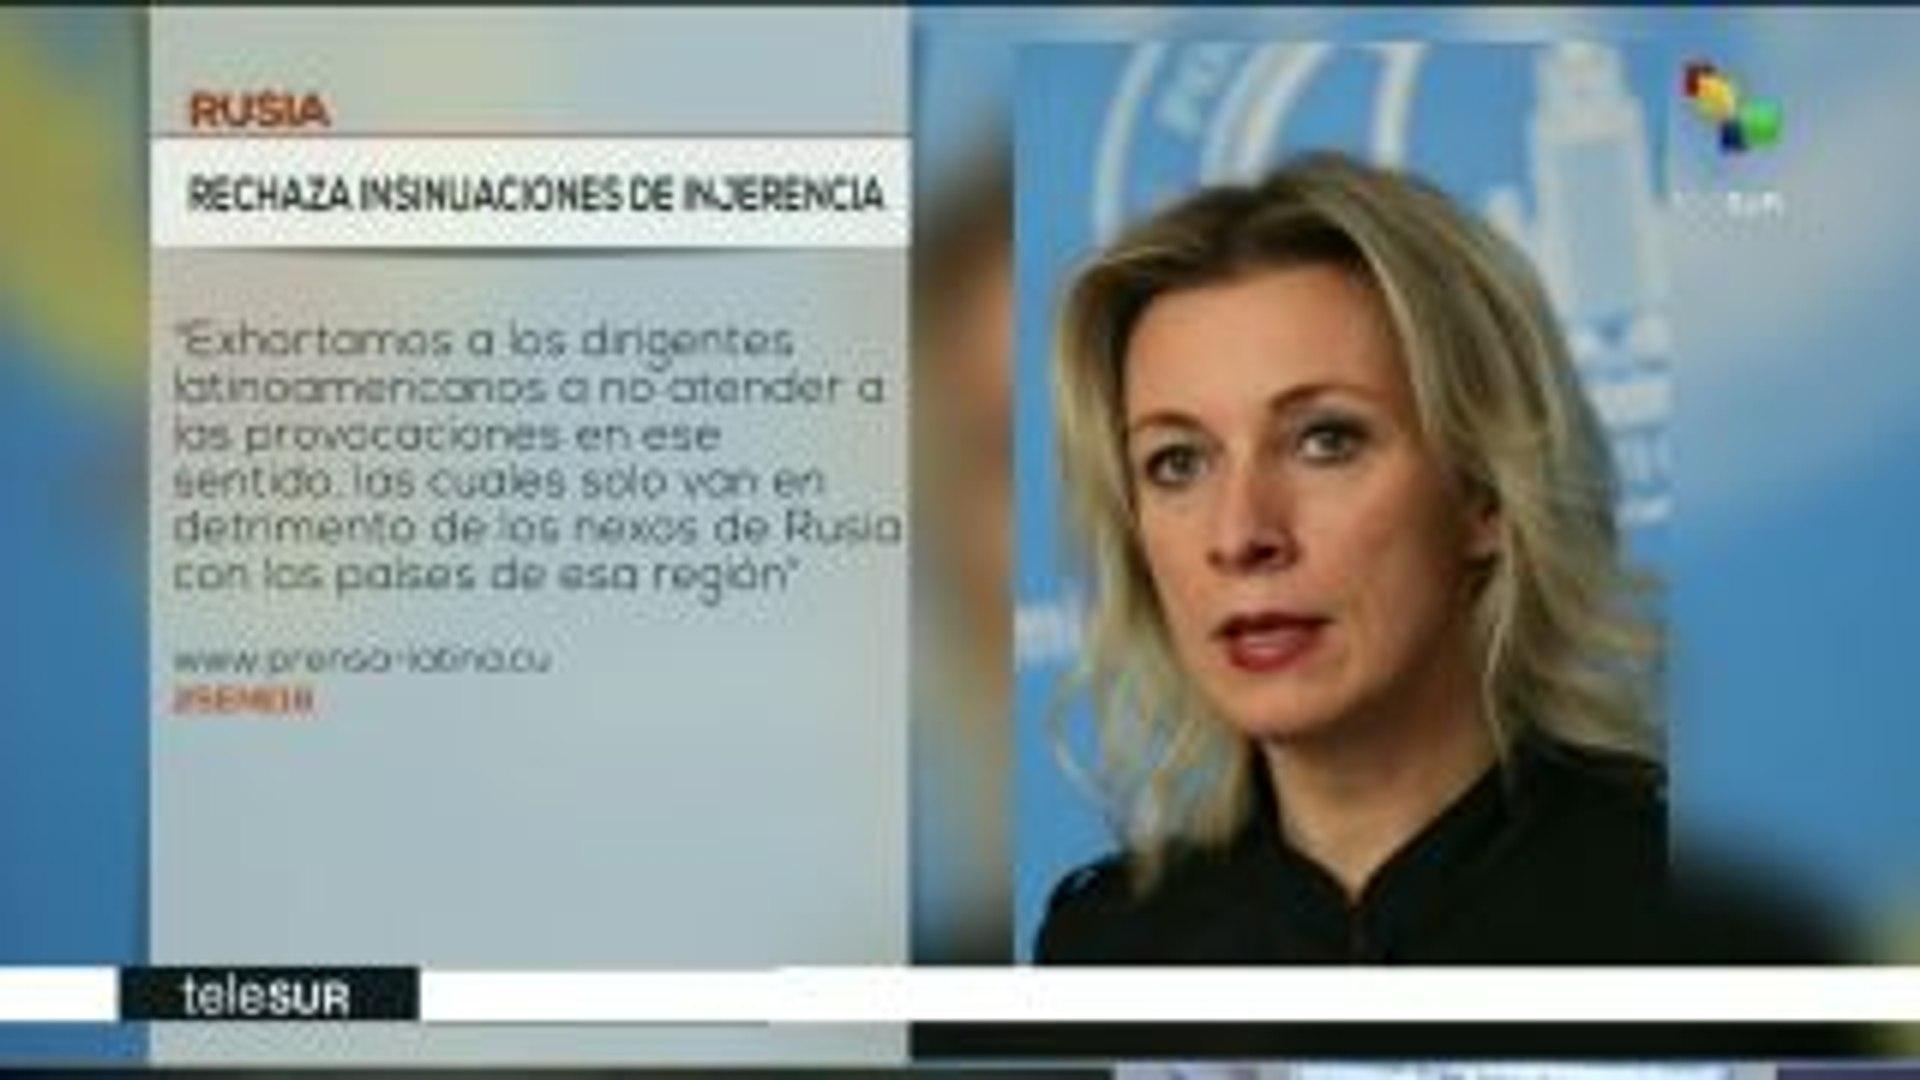 Rusia rechaza insinuaciones sobre injerencia en América Latina